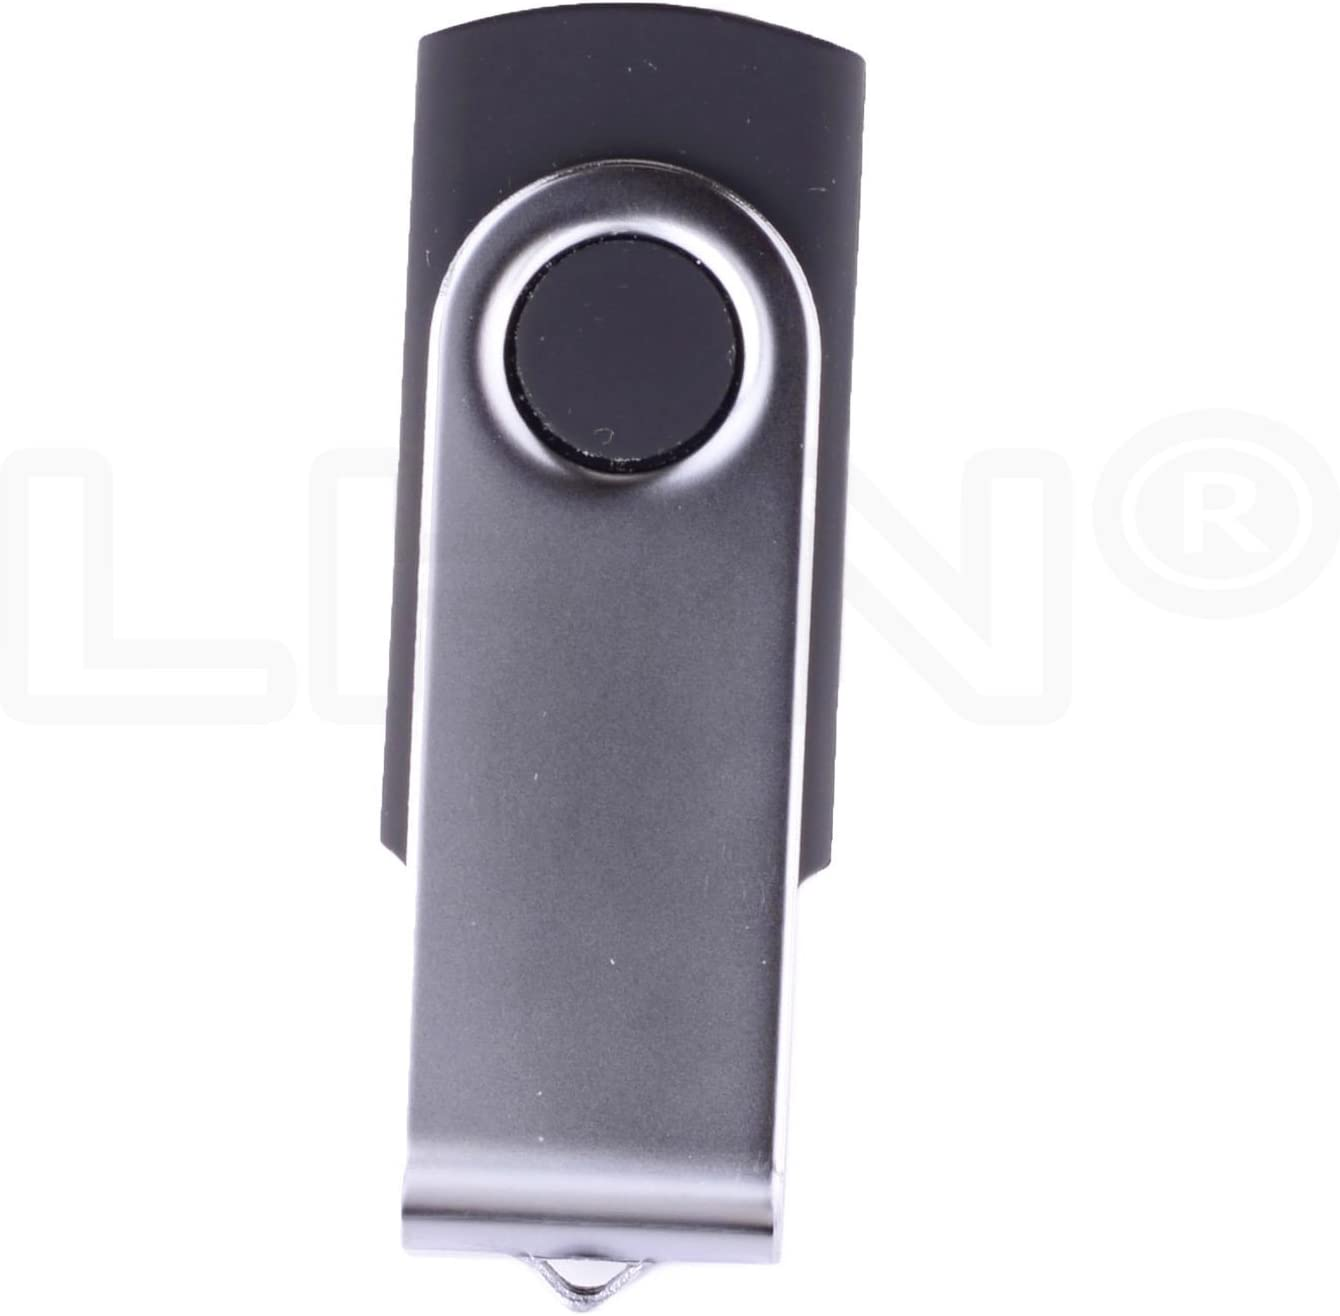 Bulk 5 Pack LHN 1GB Swivel USB Flash Drive USB 2.0 Memory Stick Black